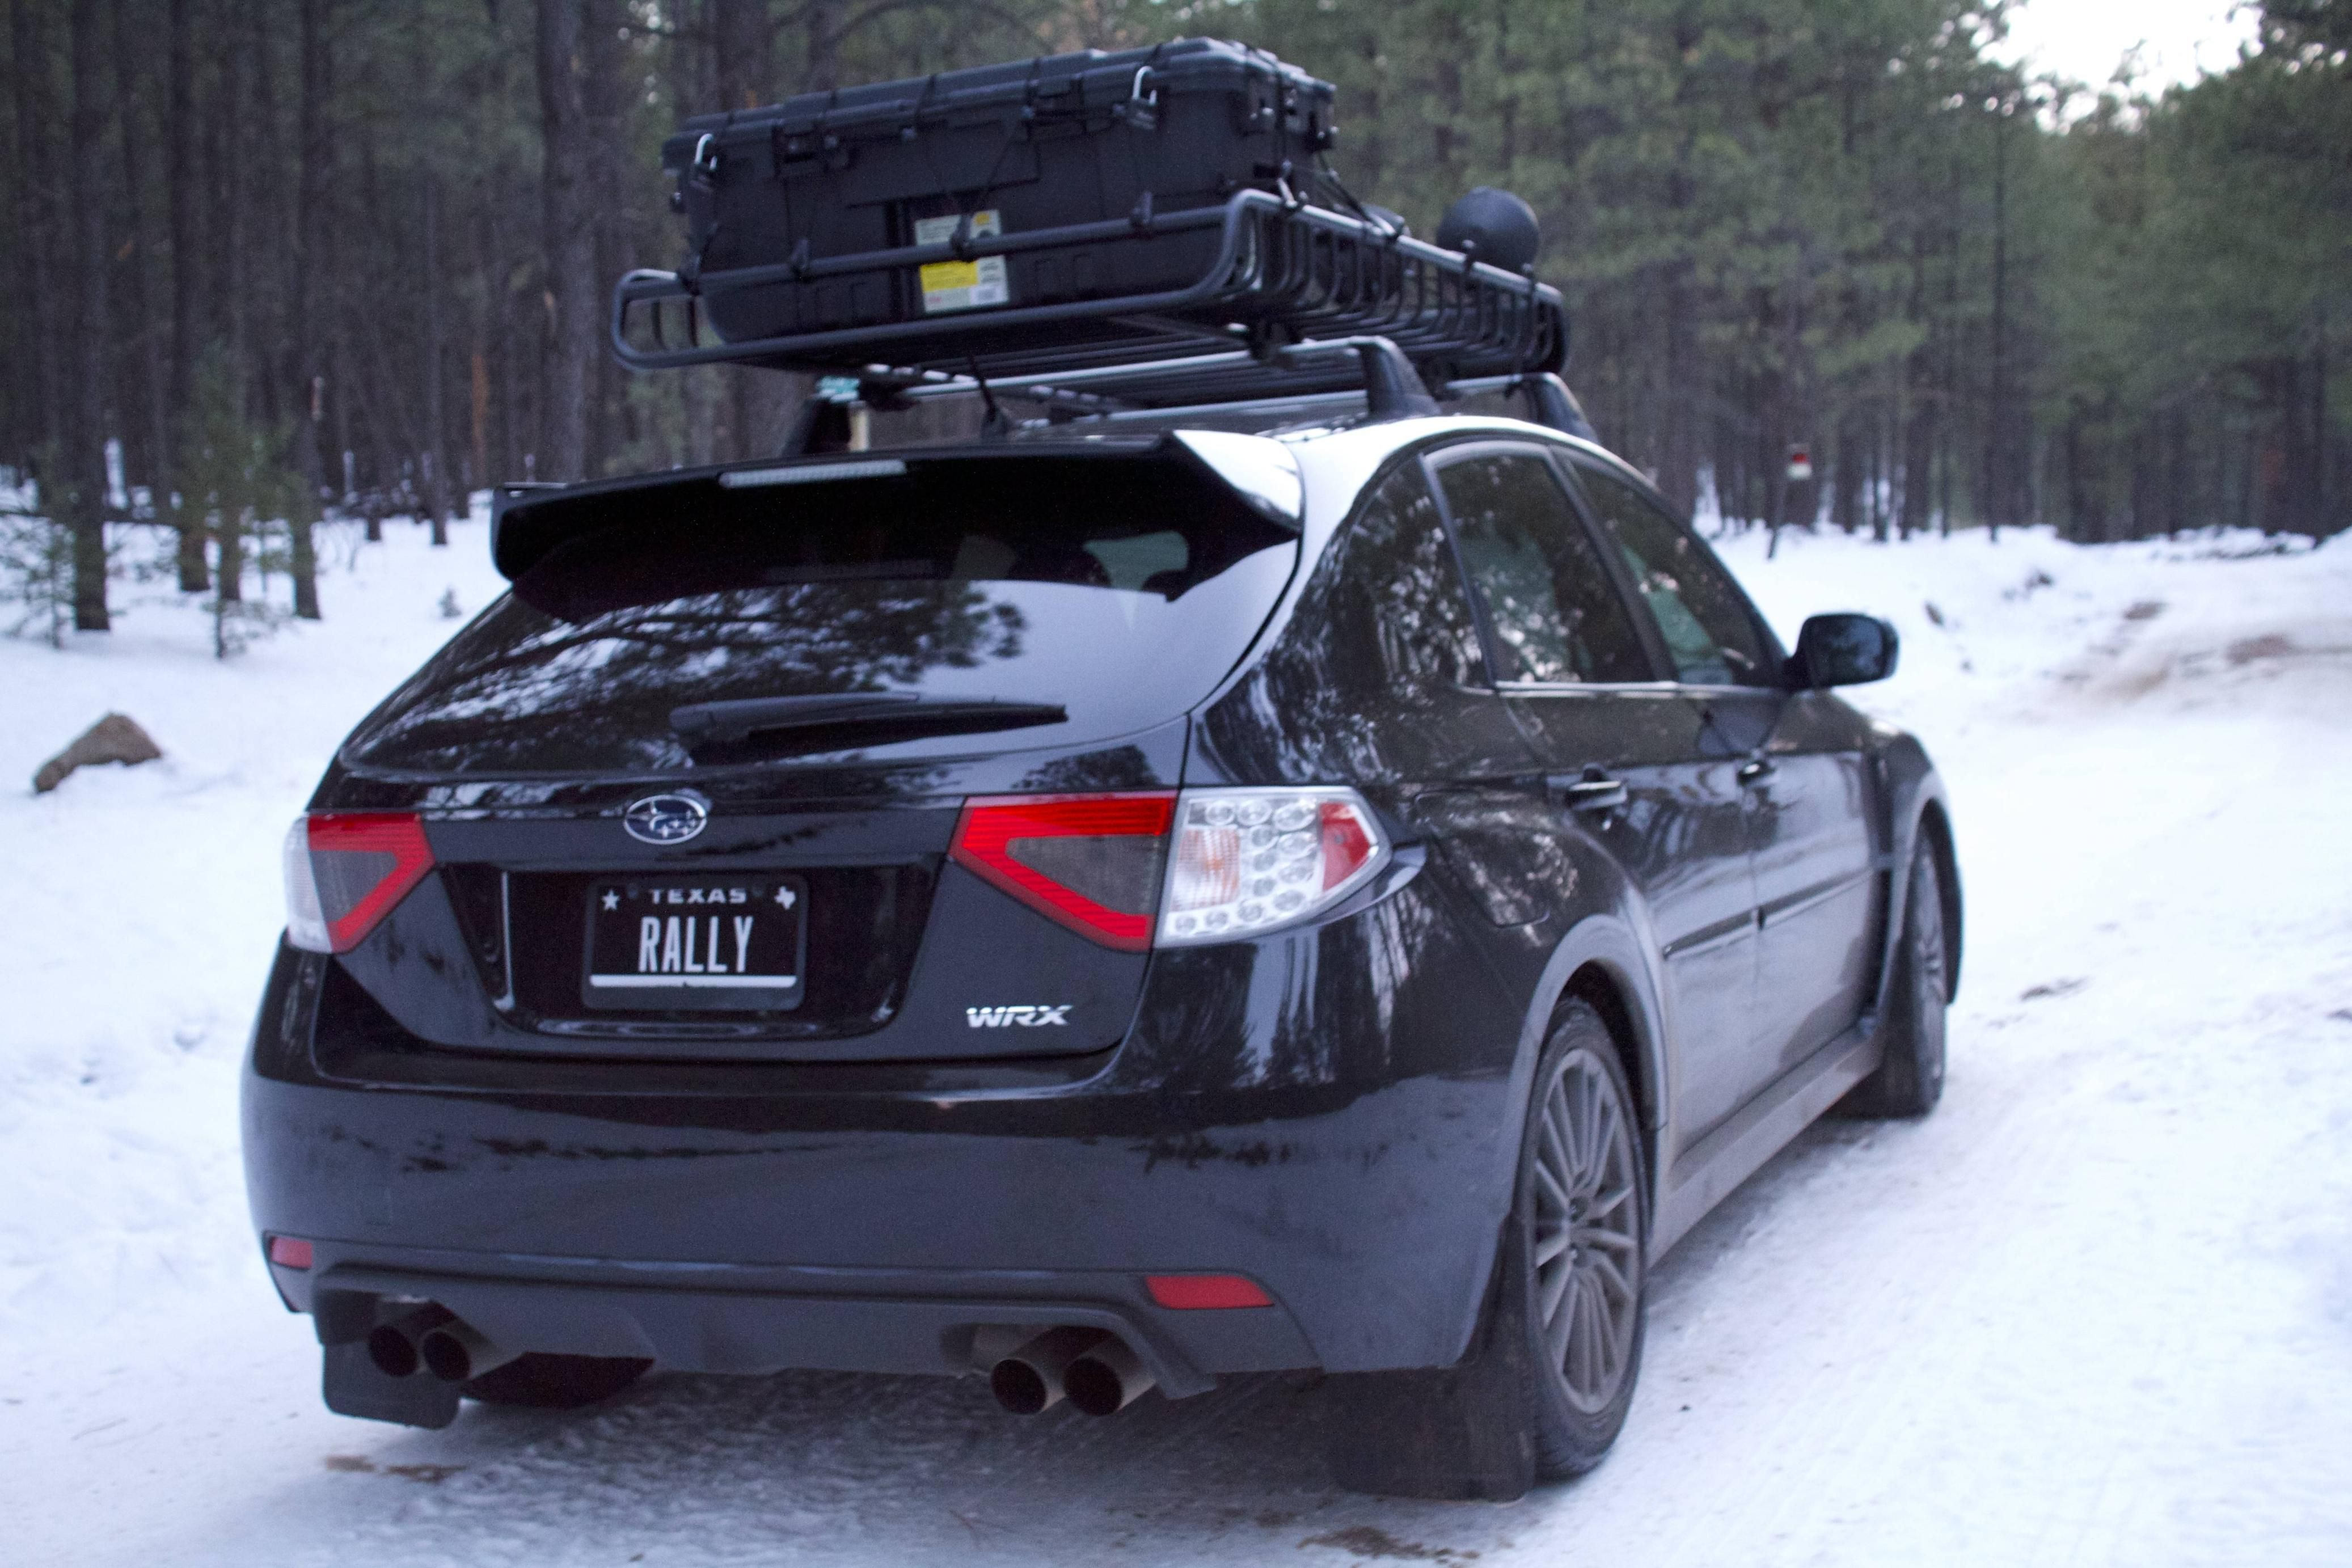 Roof Rack With Pelican Wrx Impreza Subaru Impreza